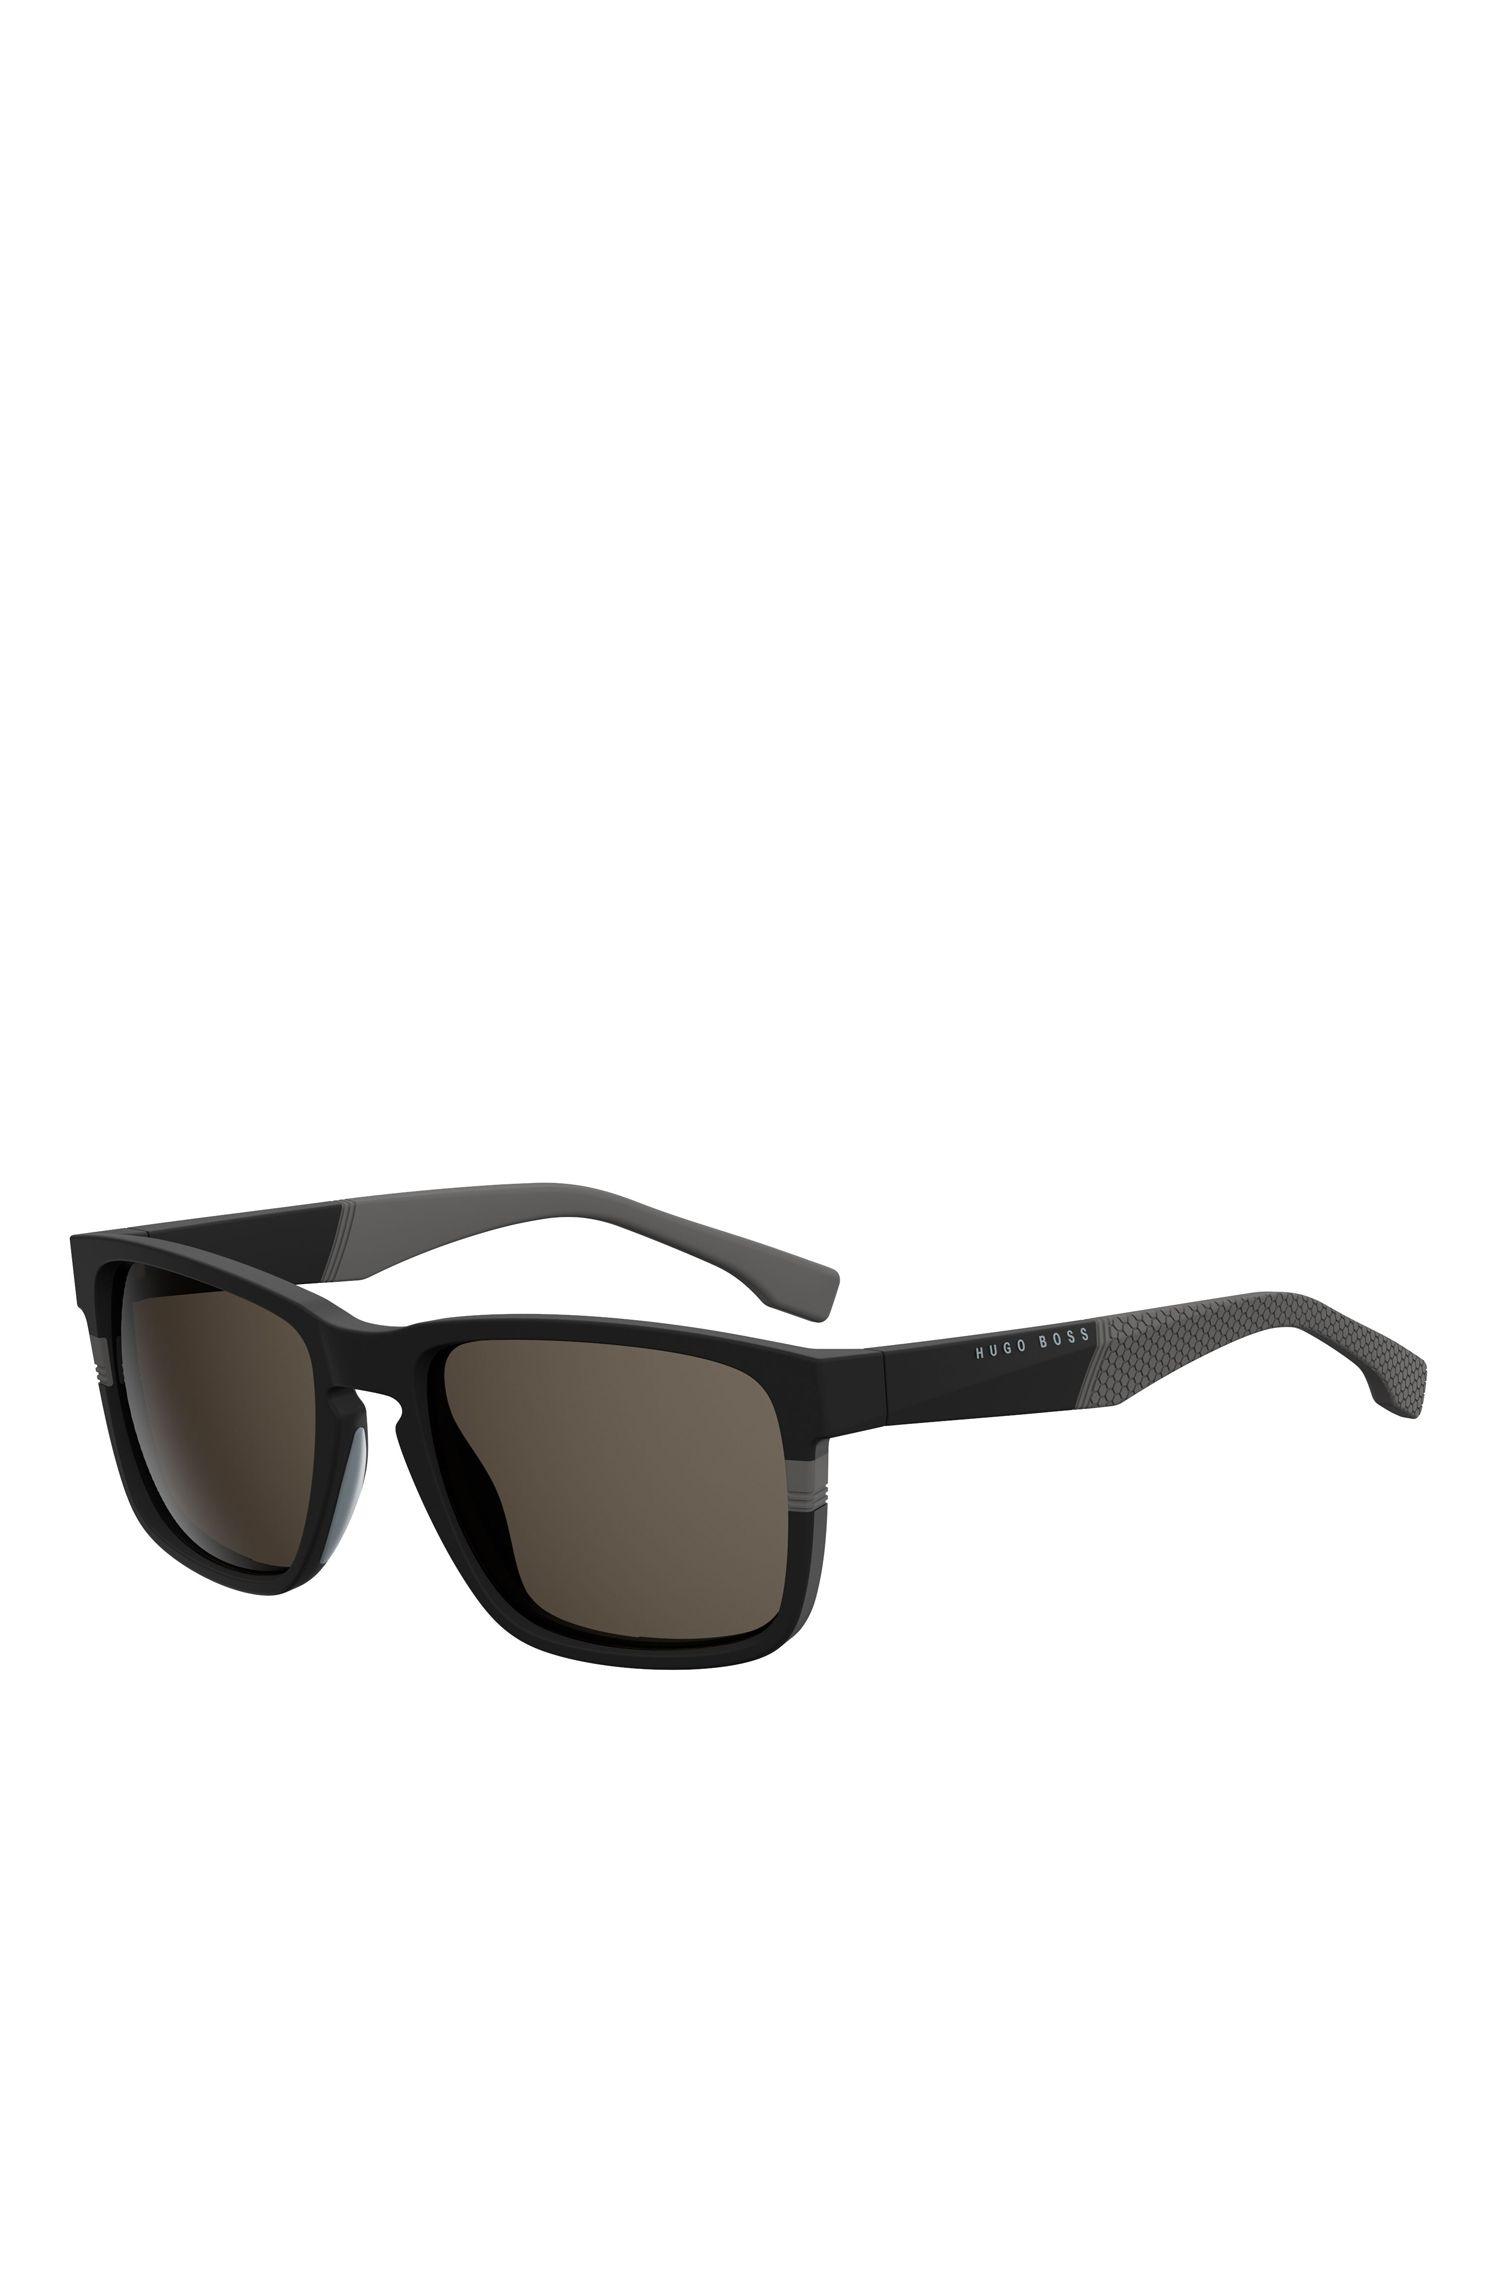 'BOSS 0916/S' | Black Rectangular Acetate Sunglasses